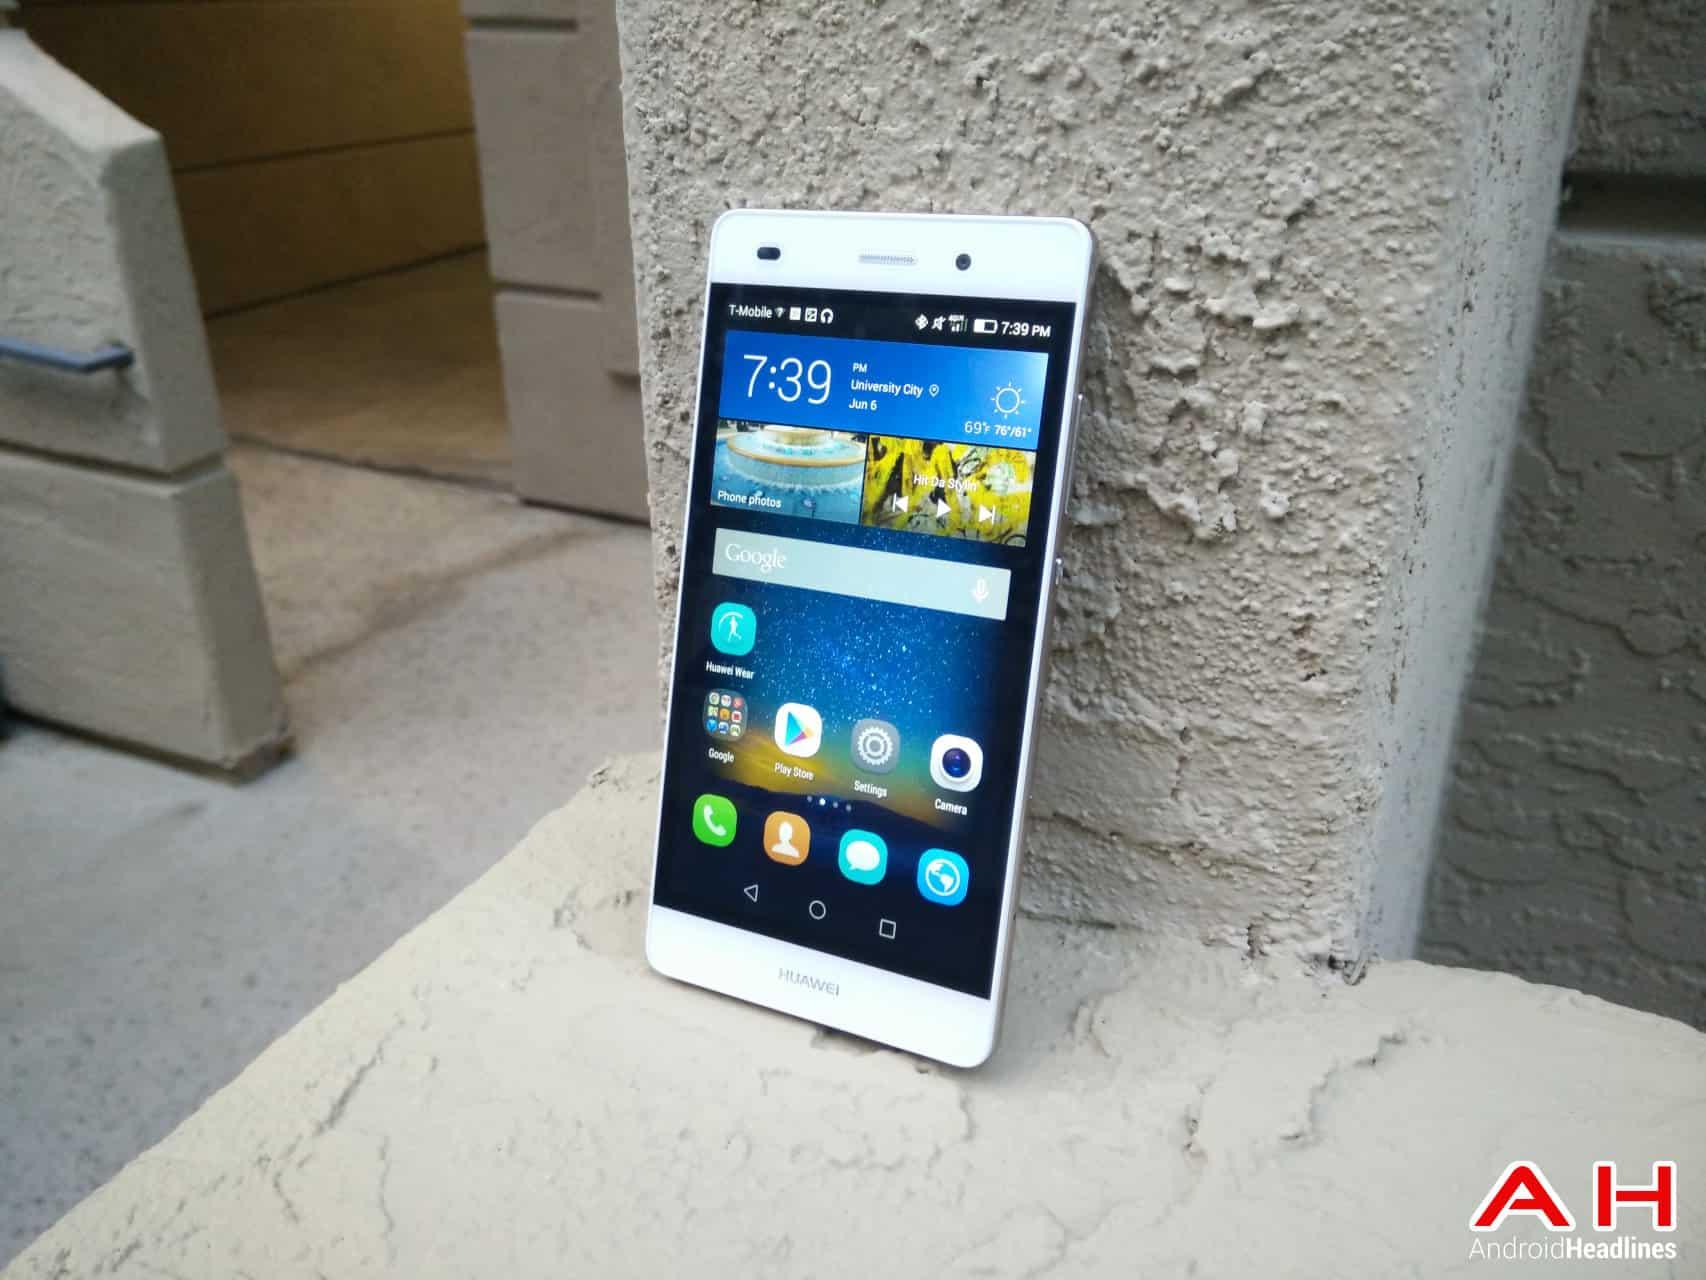 Huawei P8 Lite AH 01-27